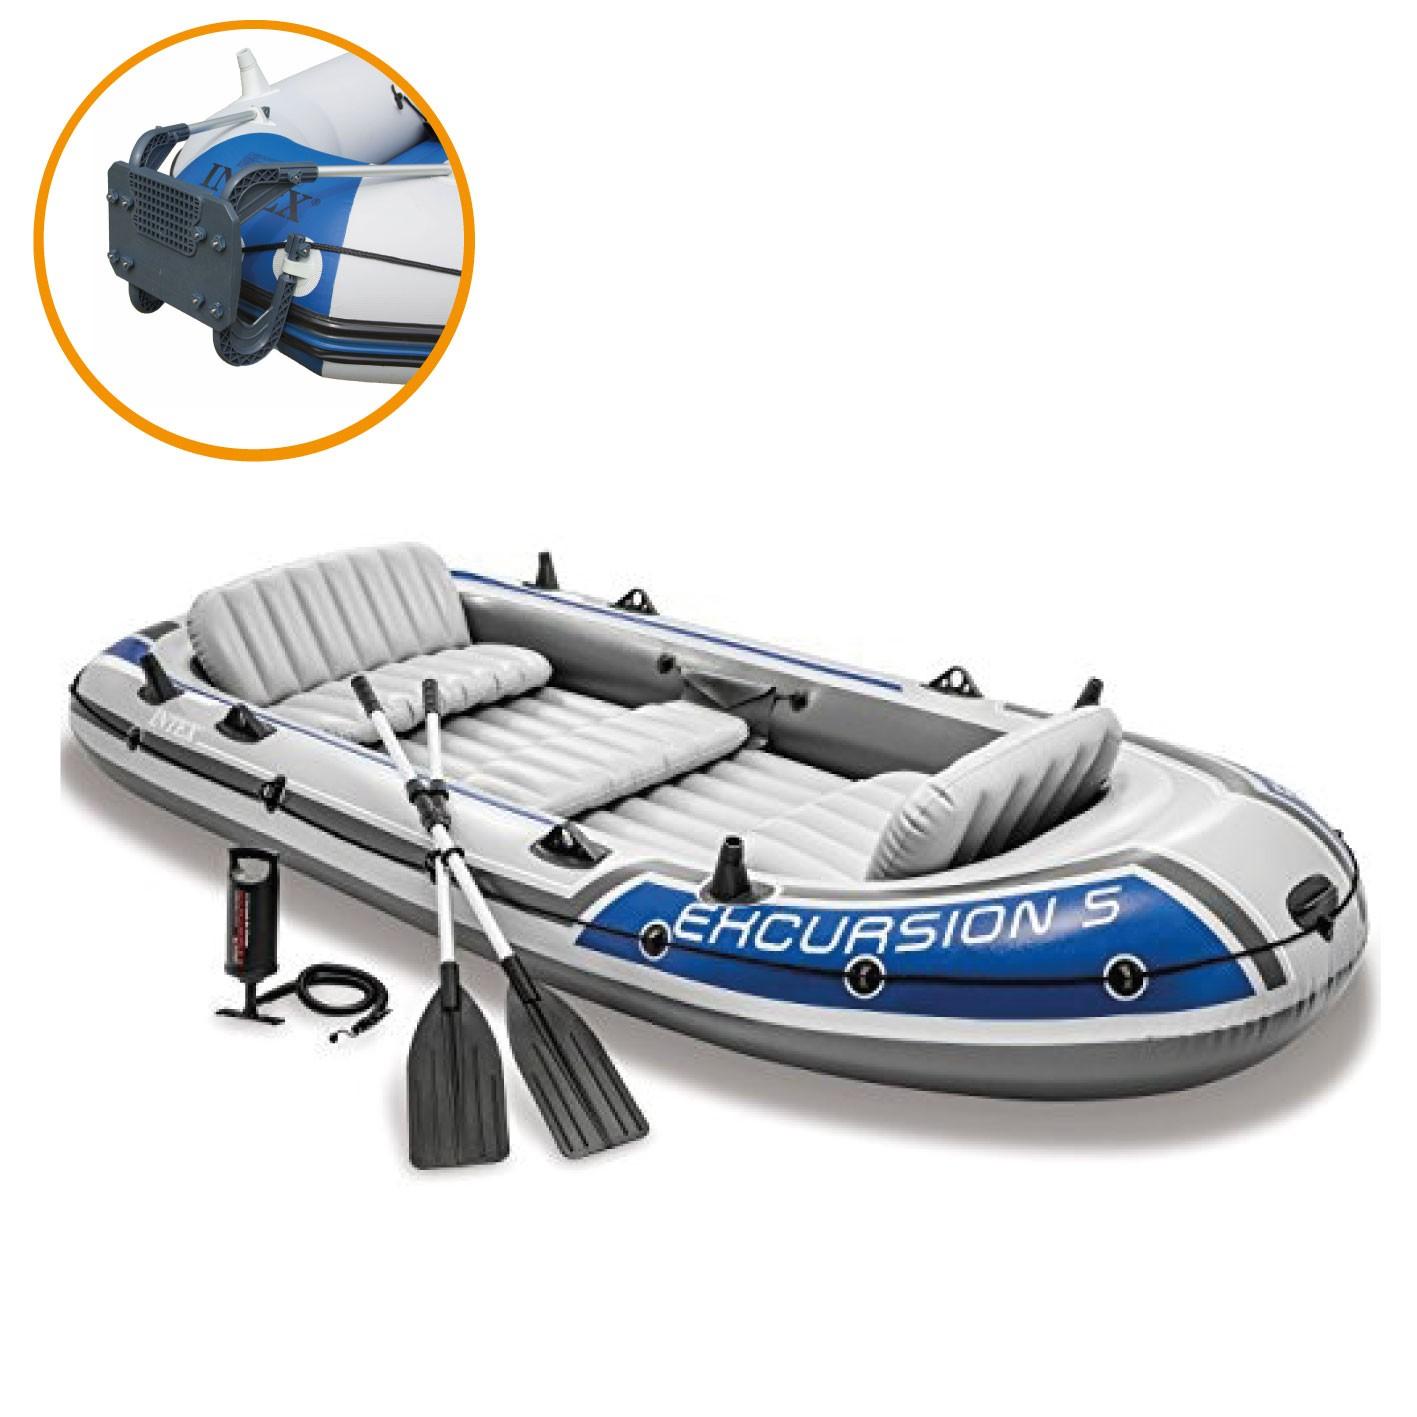 Bote Inflável Intex Excursion 5 C/ Suporte Motor Remos Barco